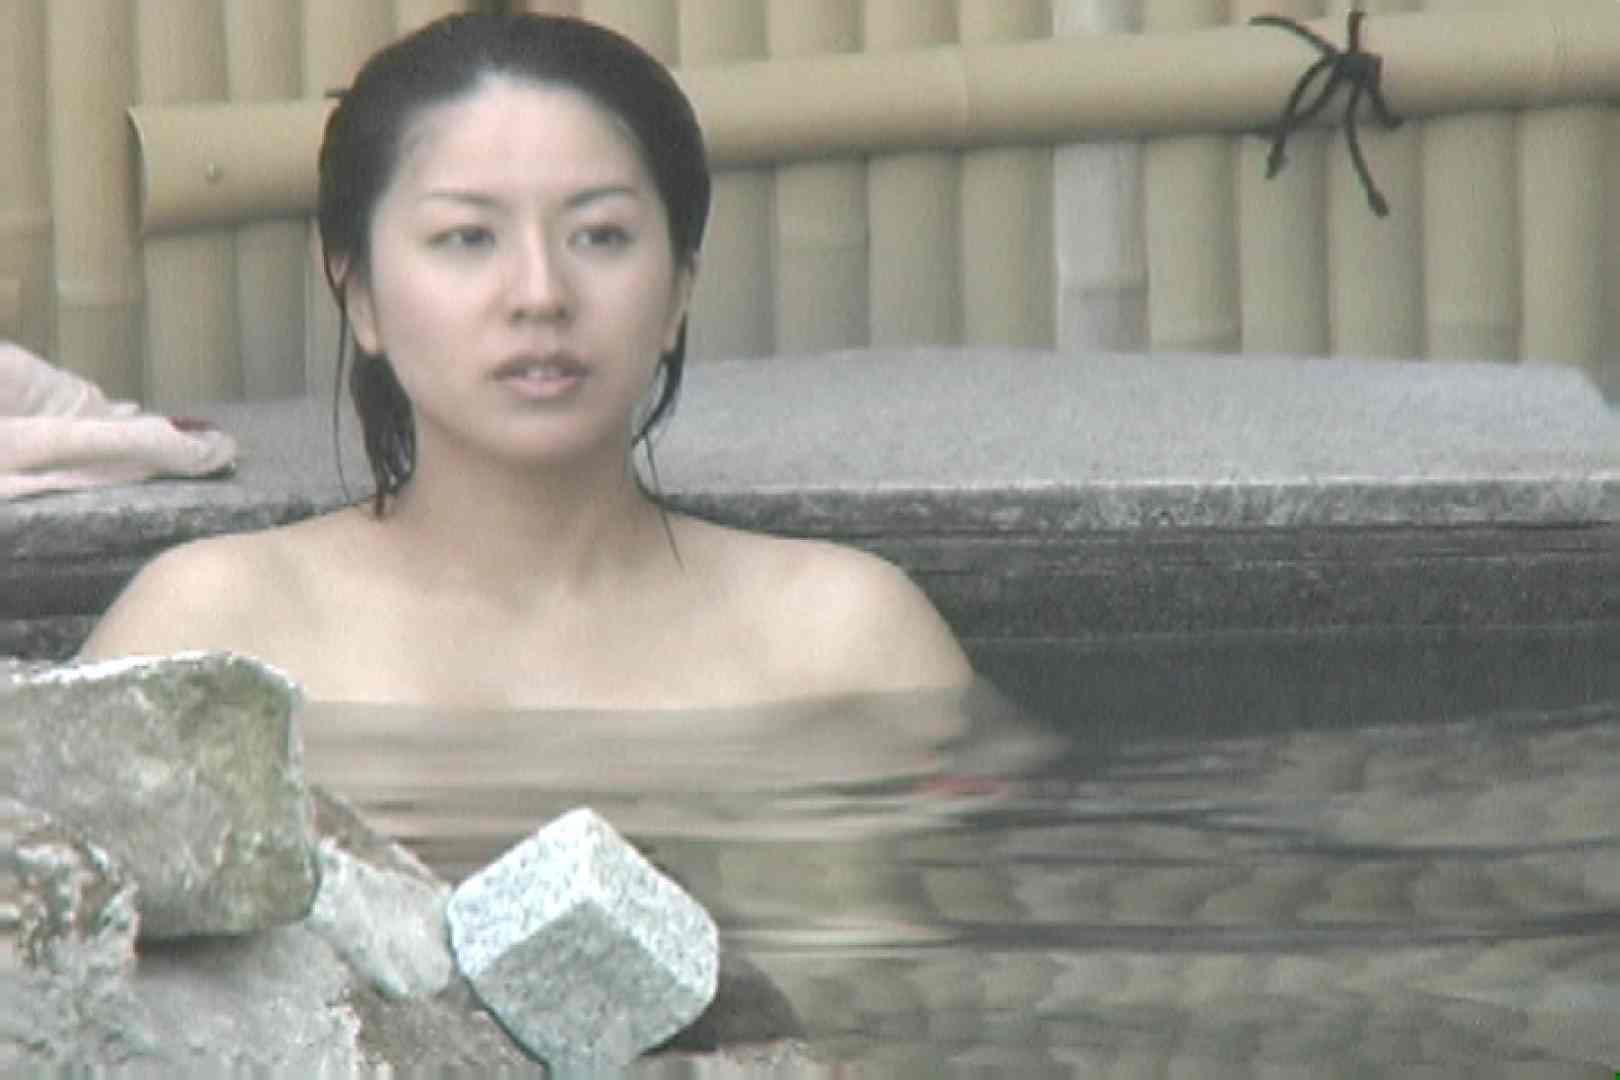 Aquaな露天風呂Vol.694 露天 | OLセックス  67画像 1